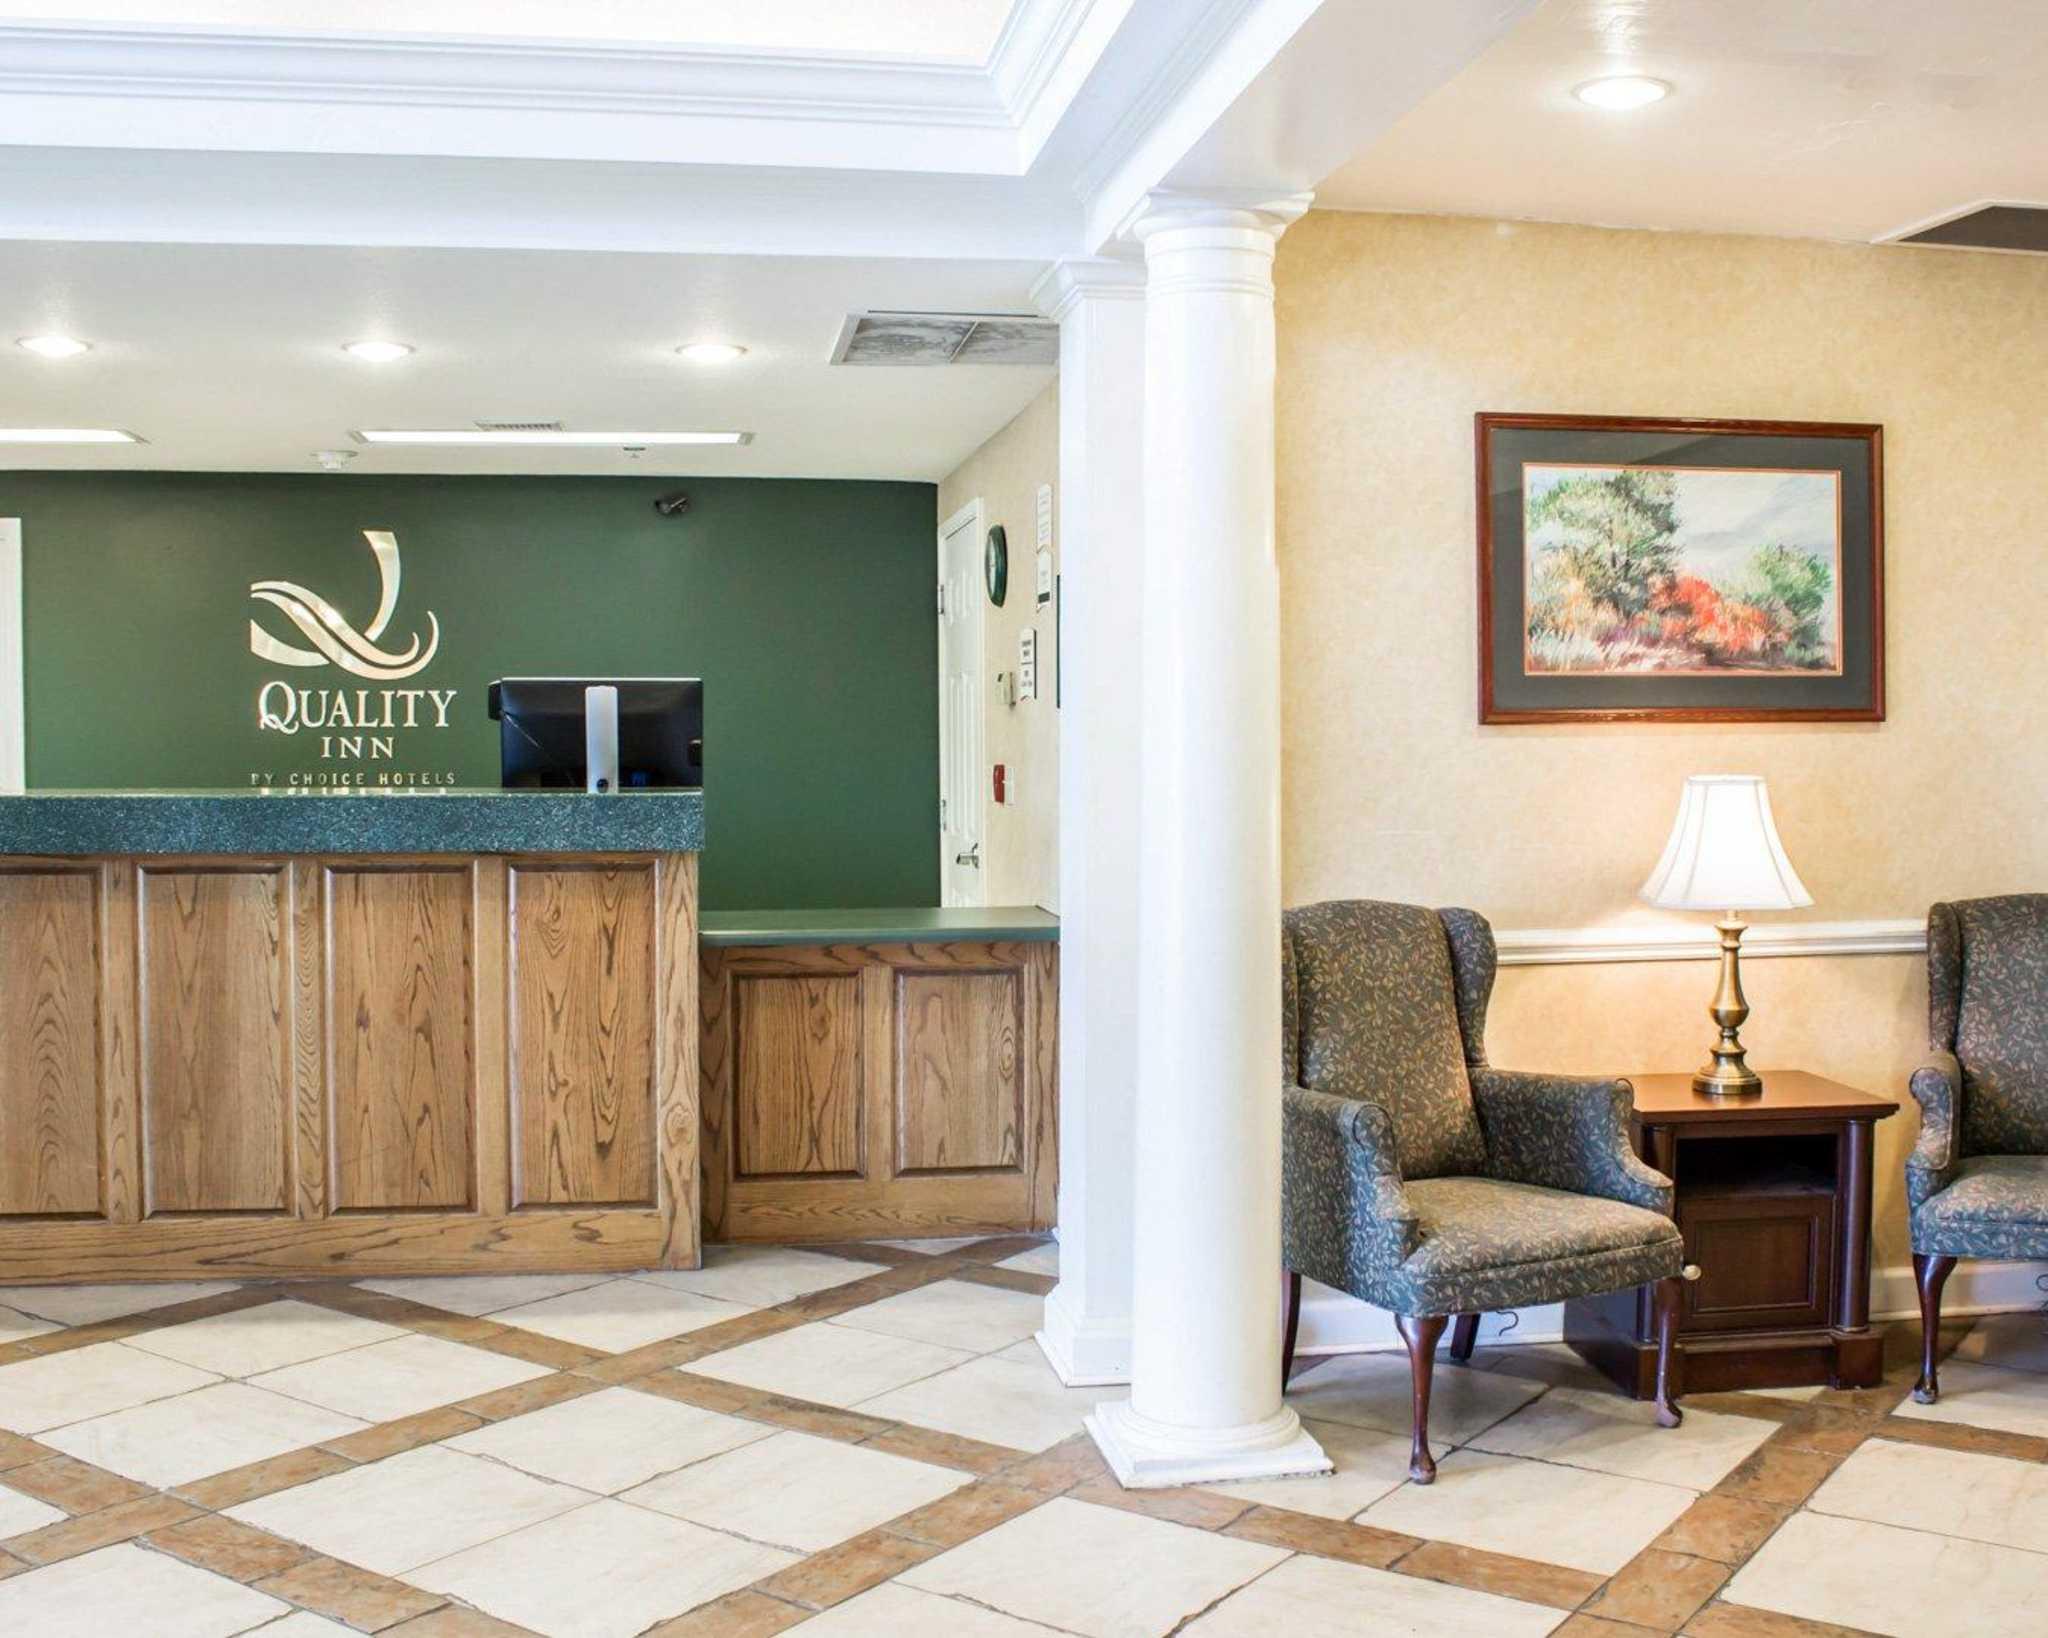 Quality Inn image 14